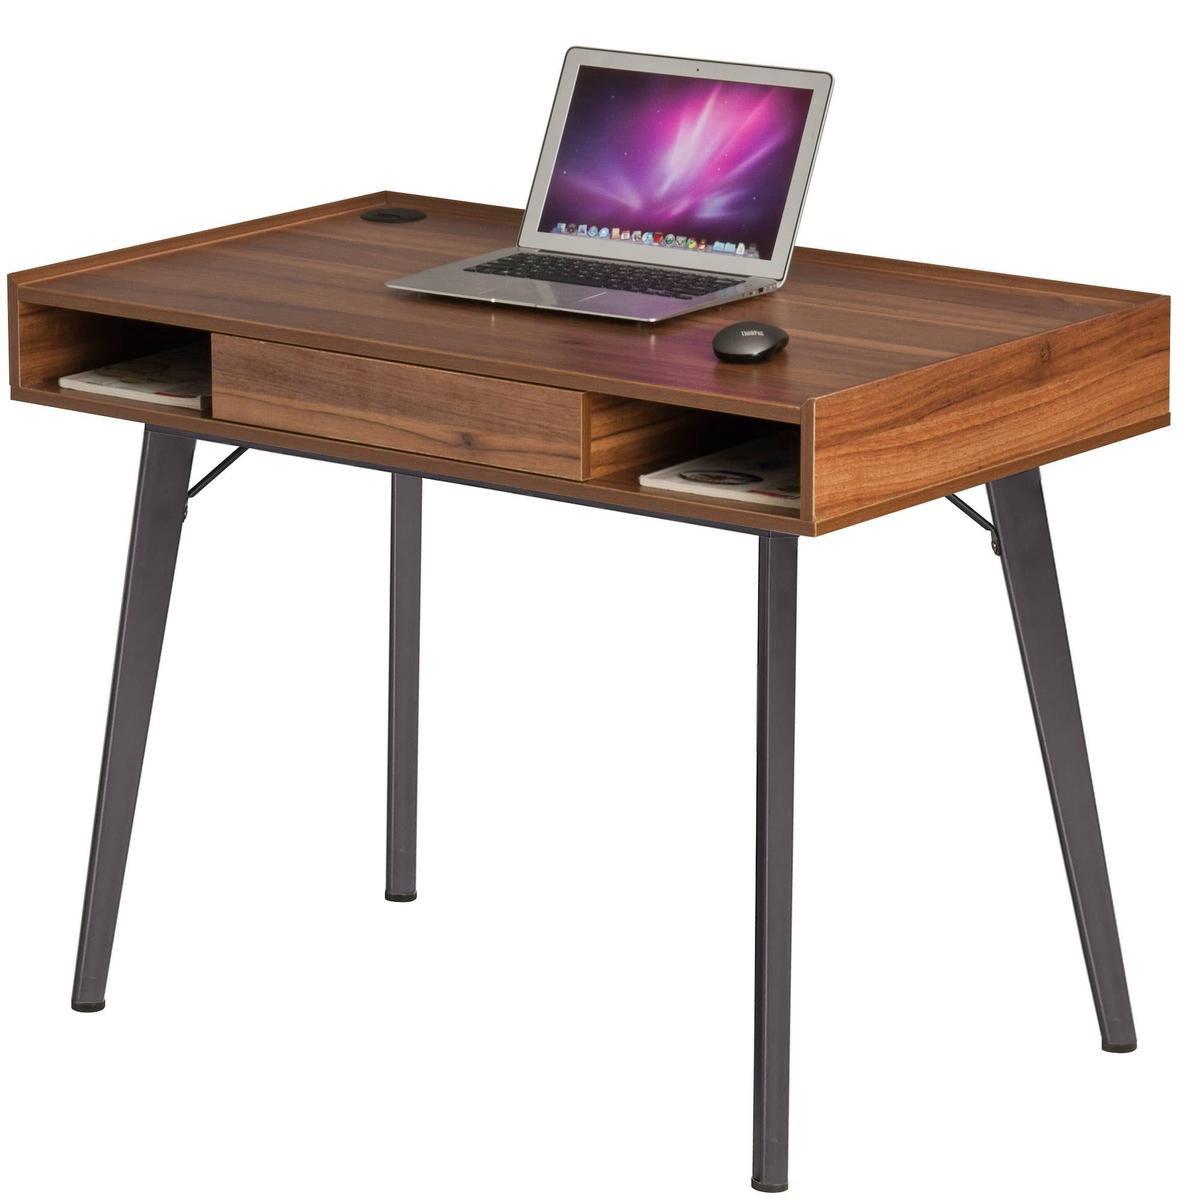 Piranha TRIGGER Vintage Bureau / Retro Computerbureau – Lade - Opbergvakken - PC 43n - 100x60x77 cm - Piranha Furniture